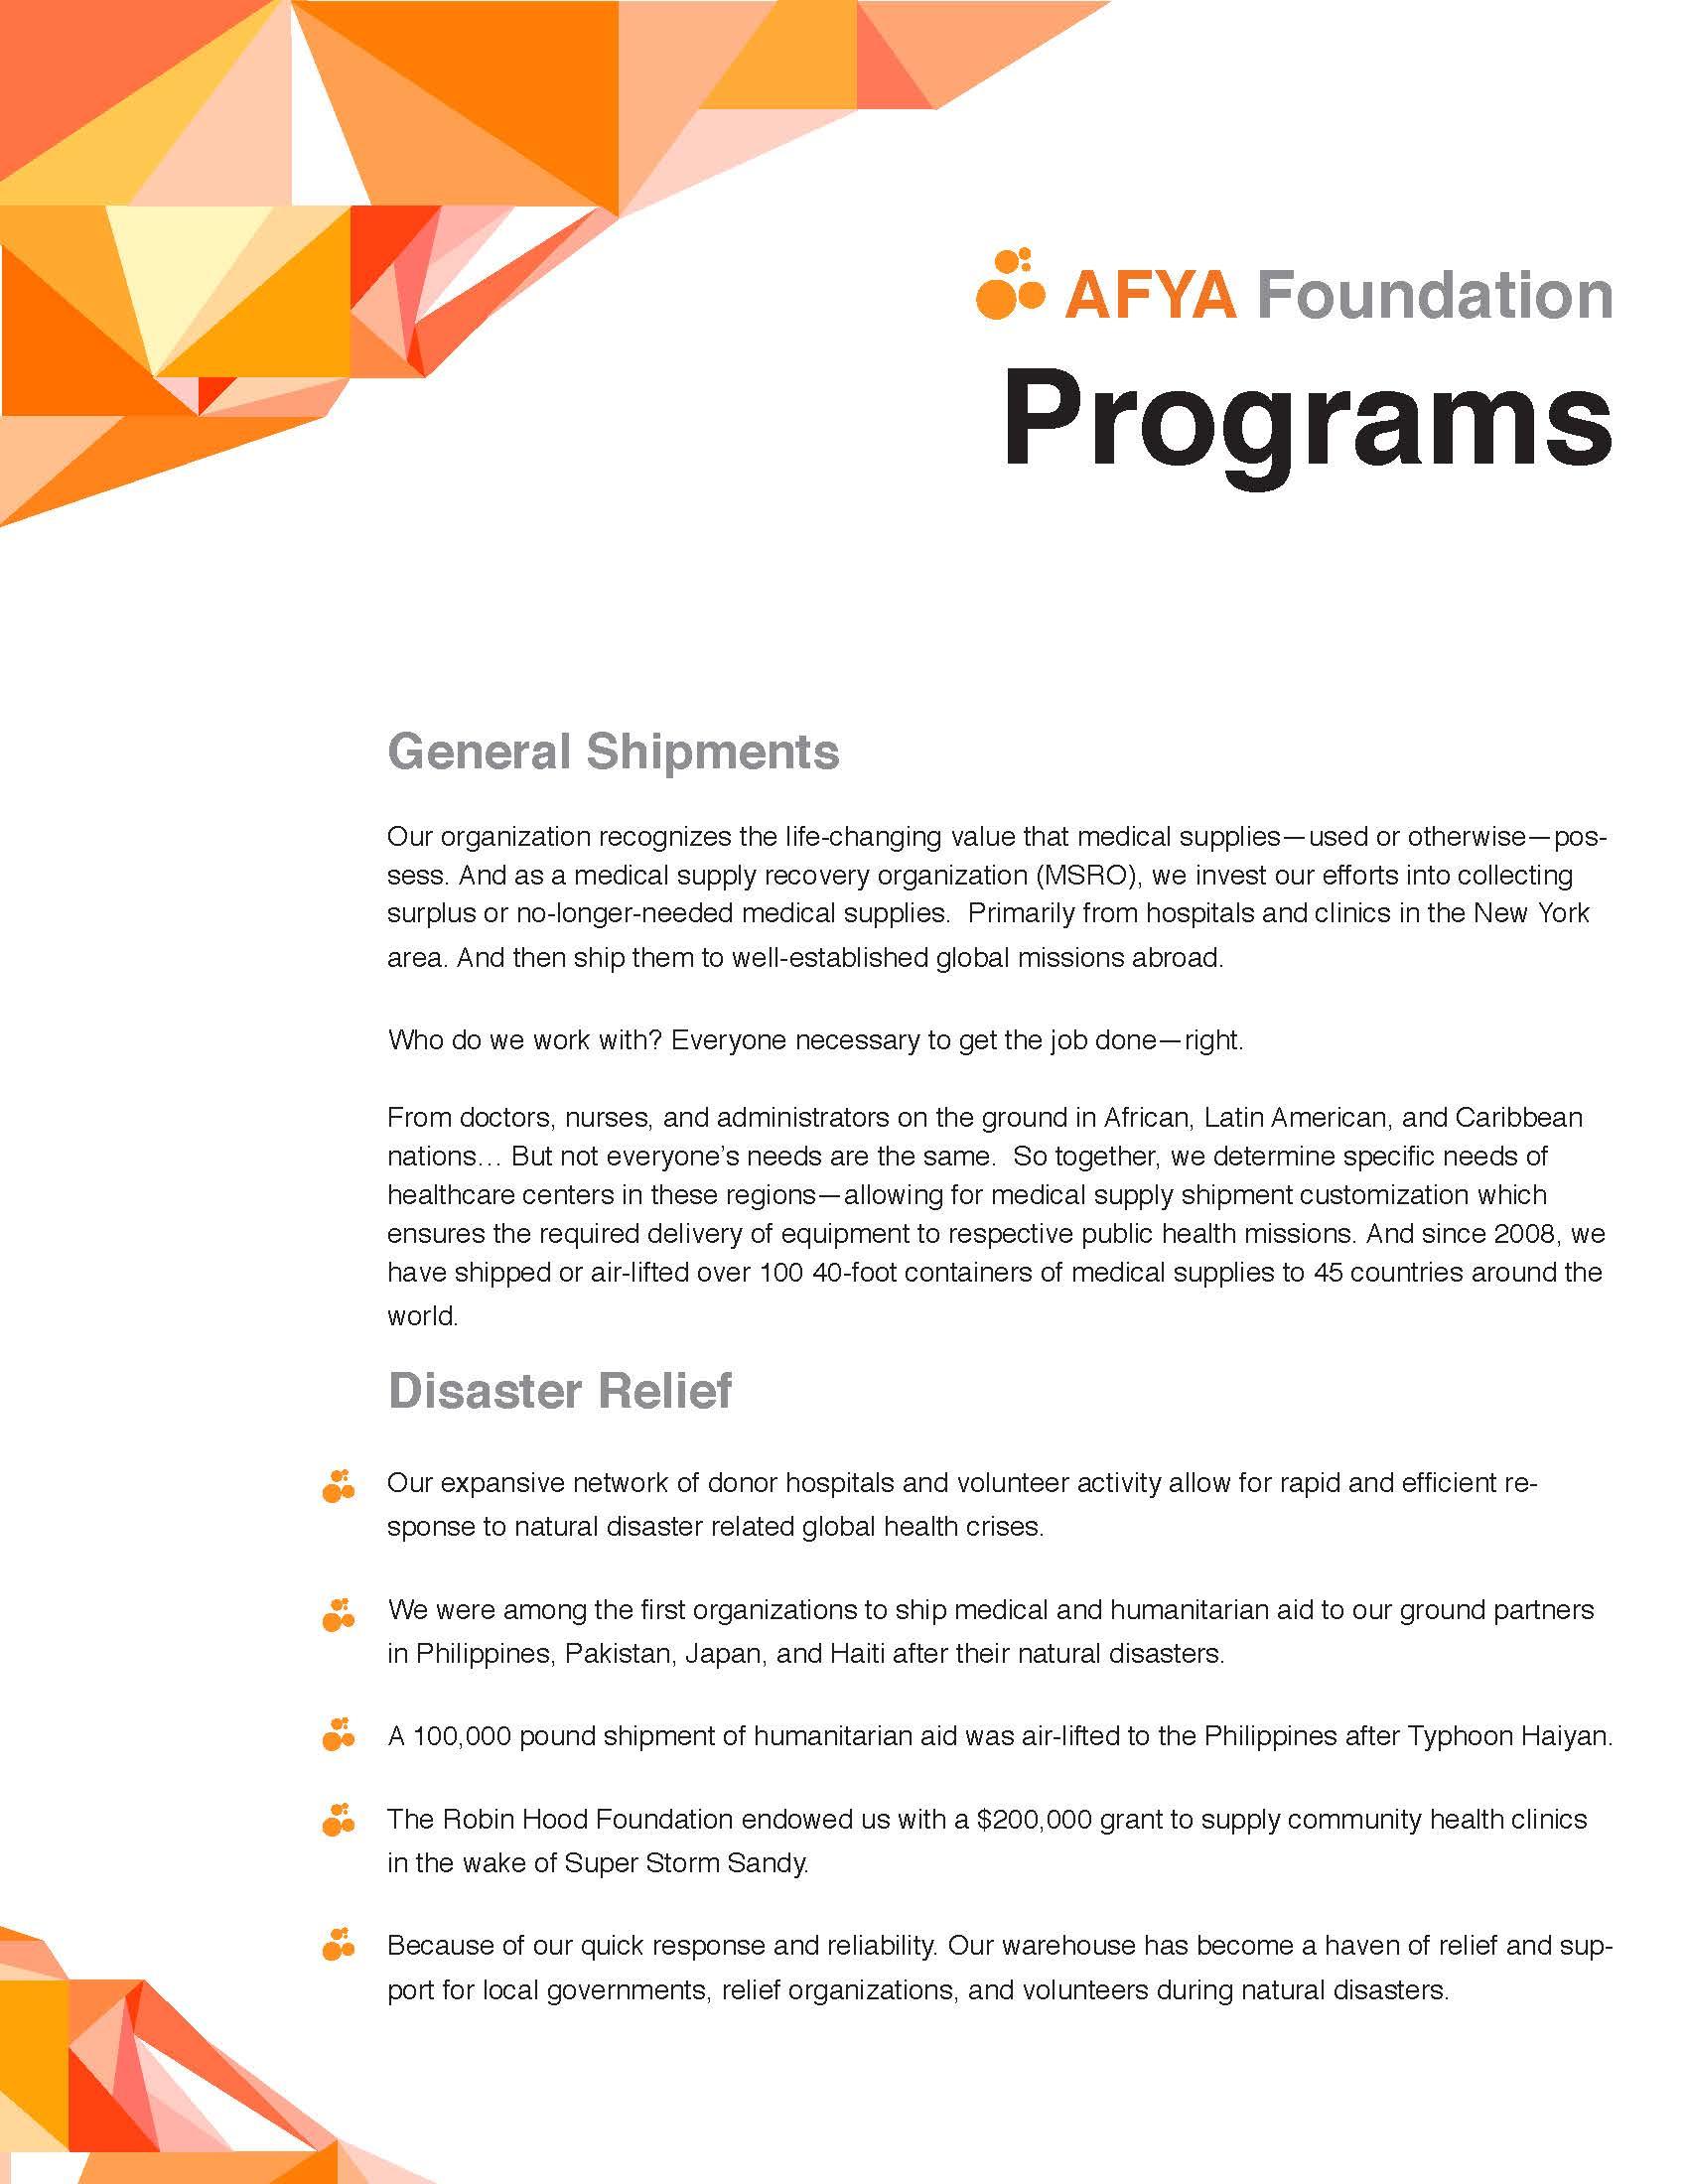 AFYA Programs